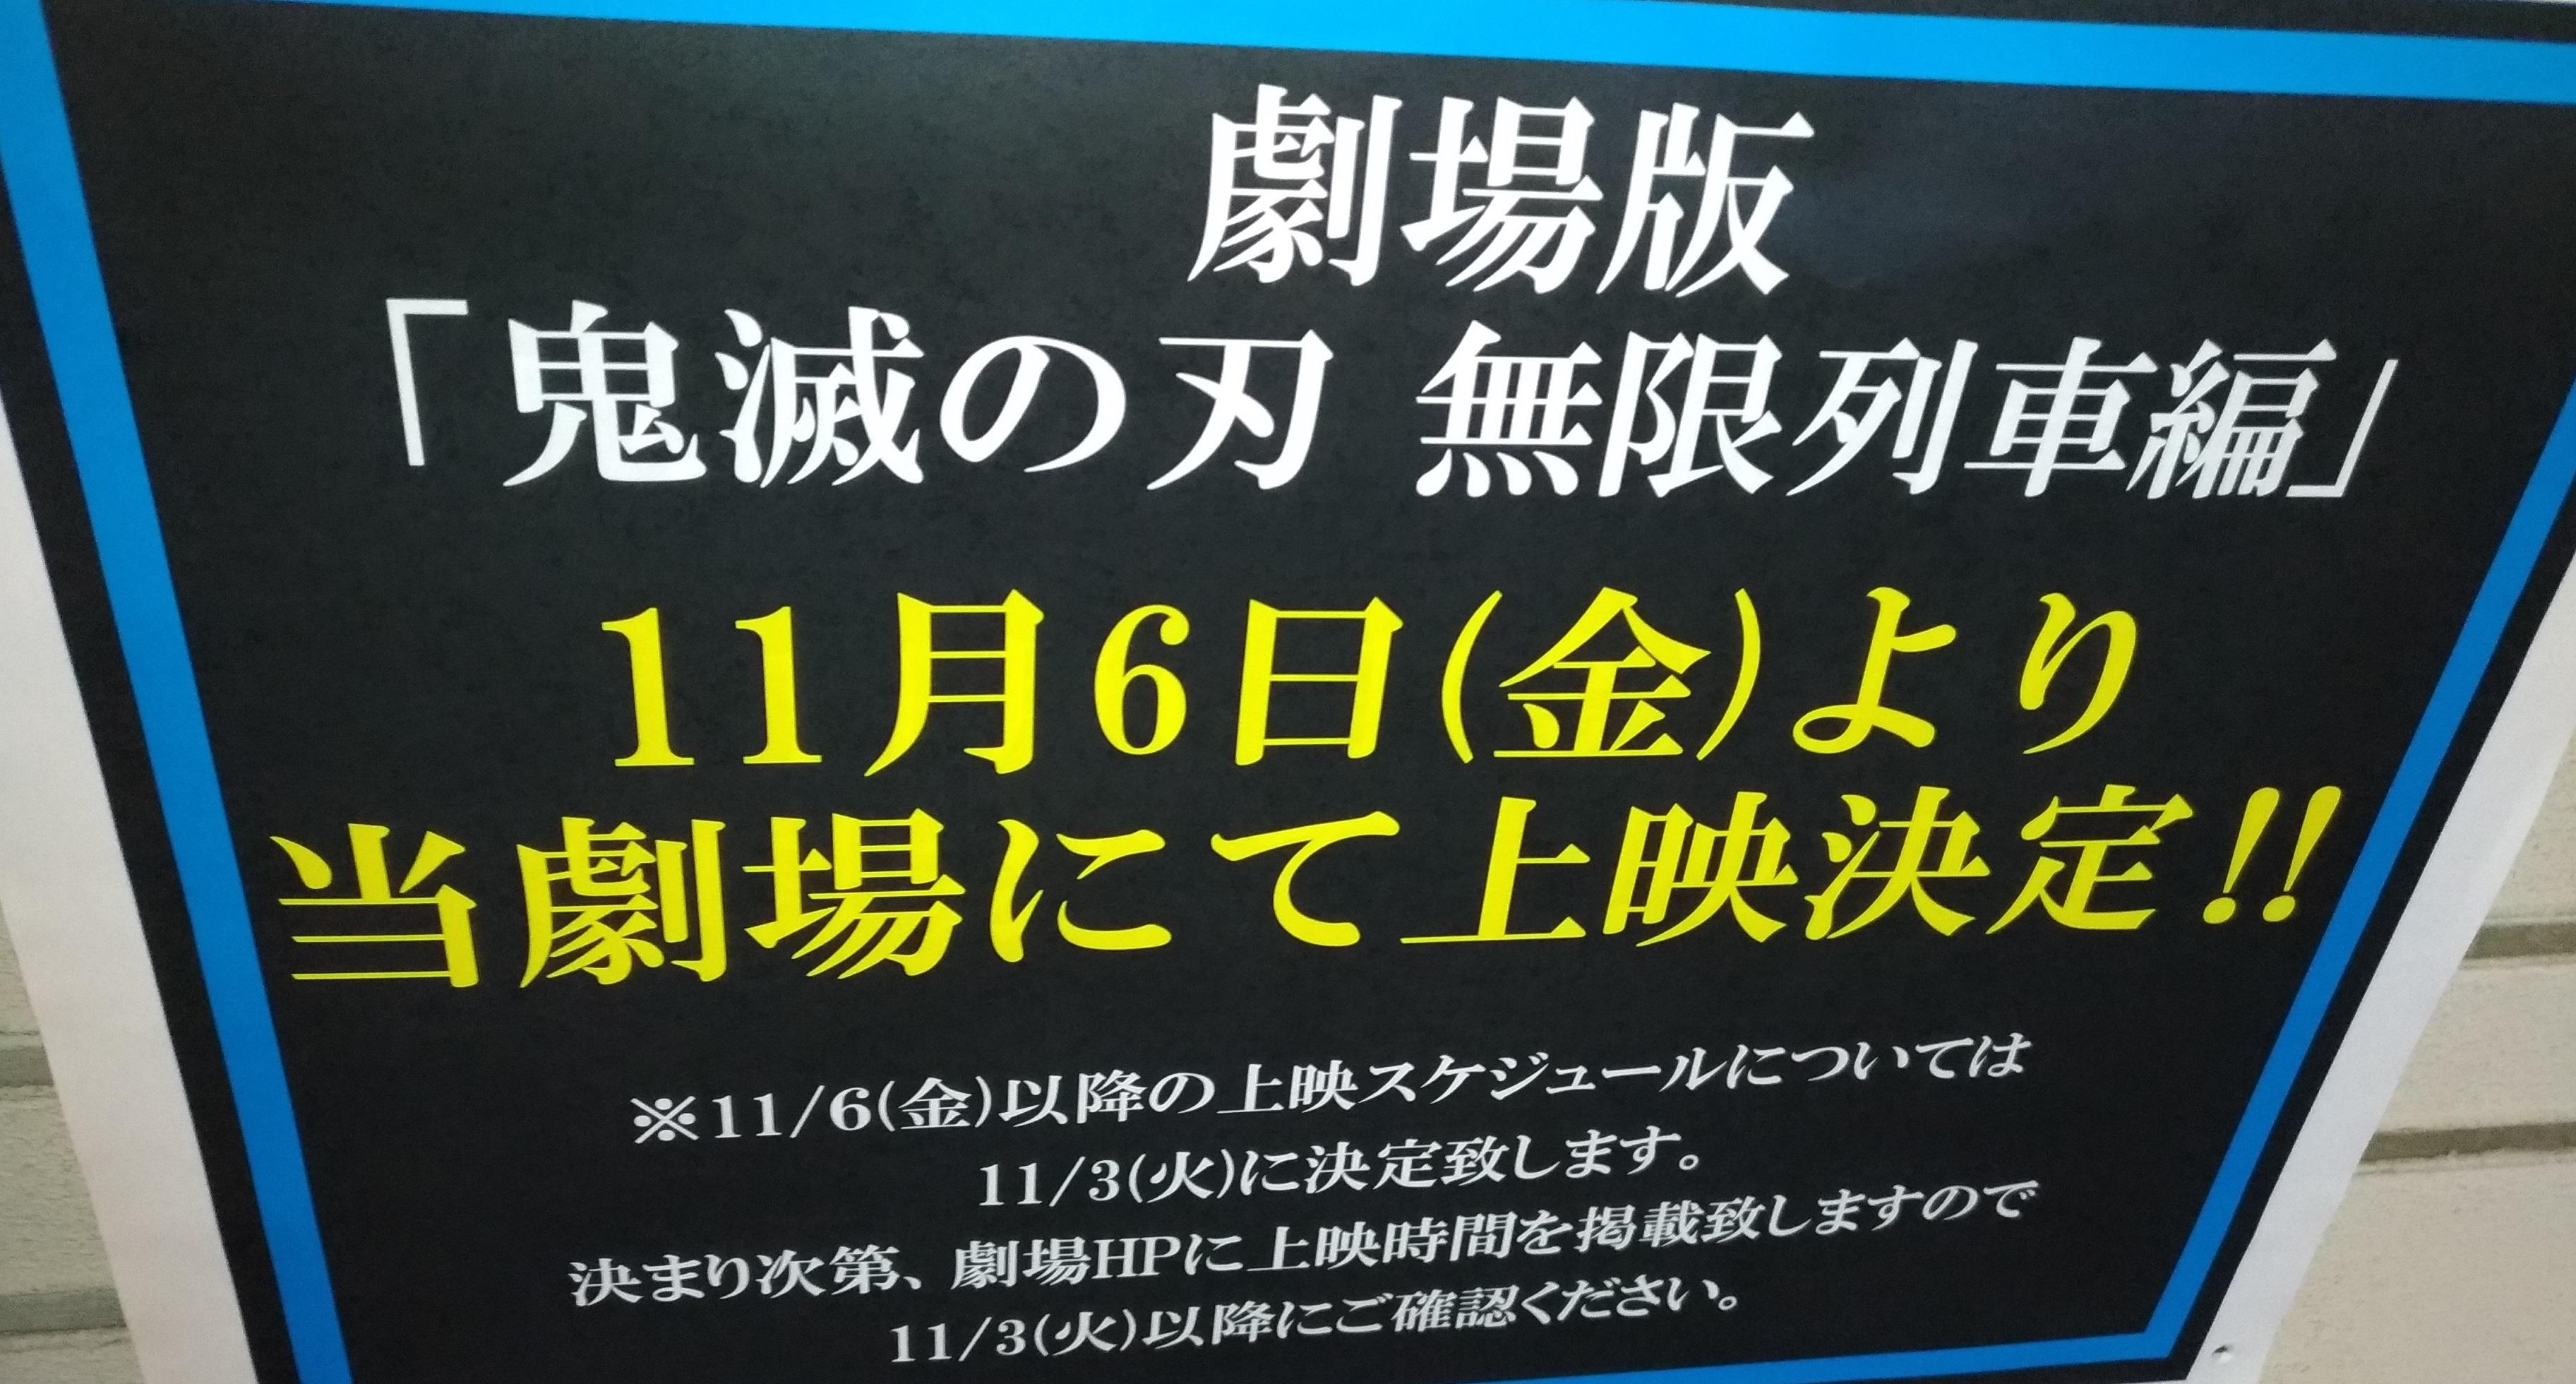 kimetsu_yaiba_1030_osaka_stationcity_cinema_1.jpg